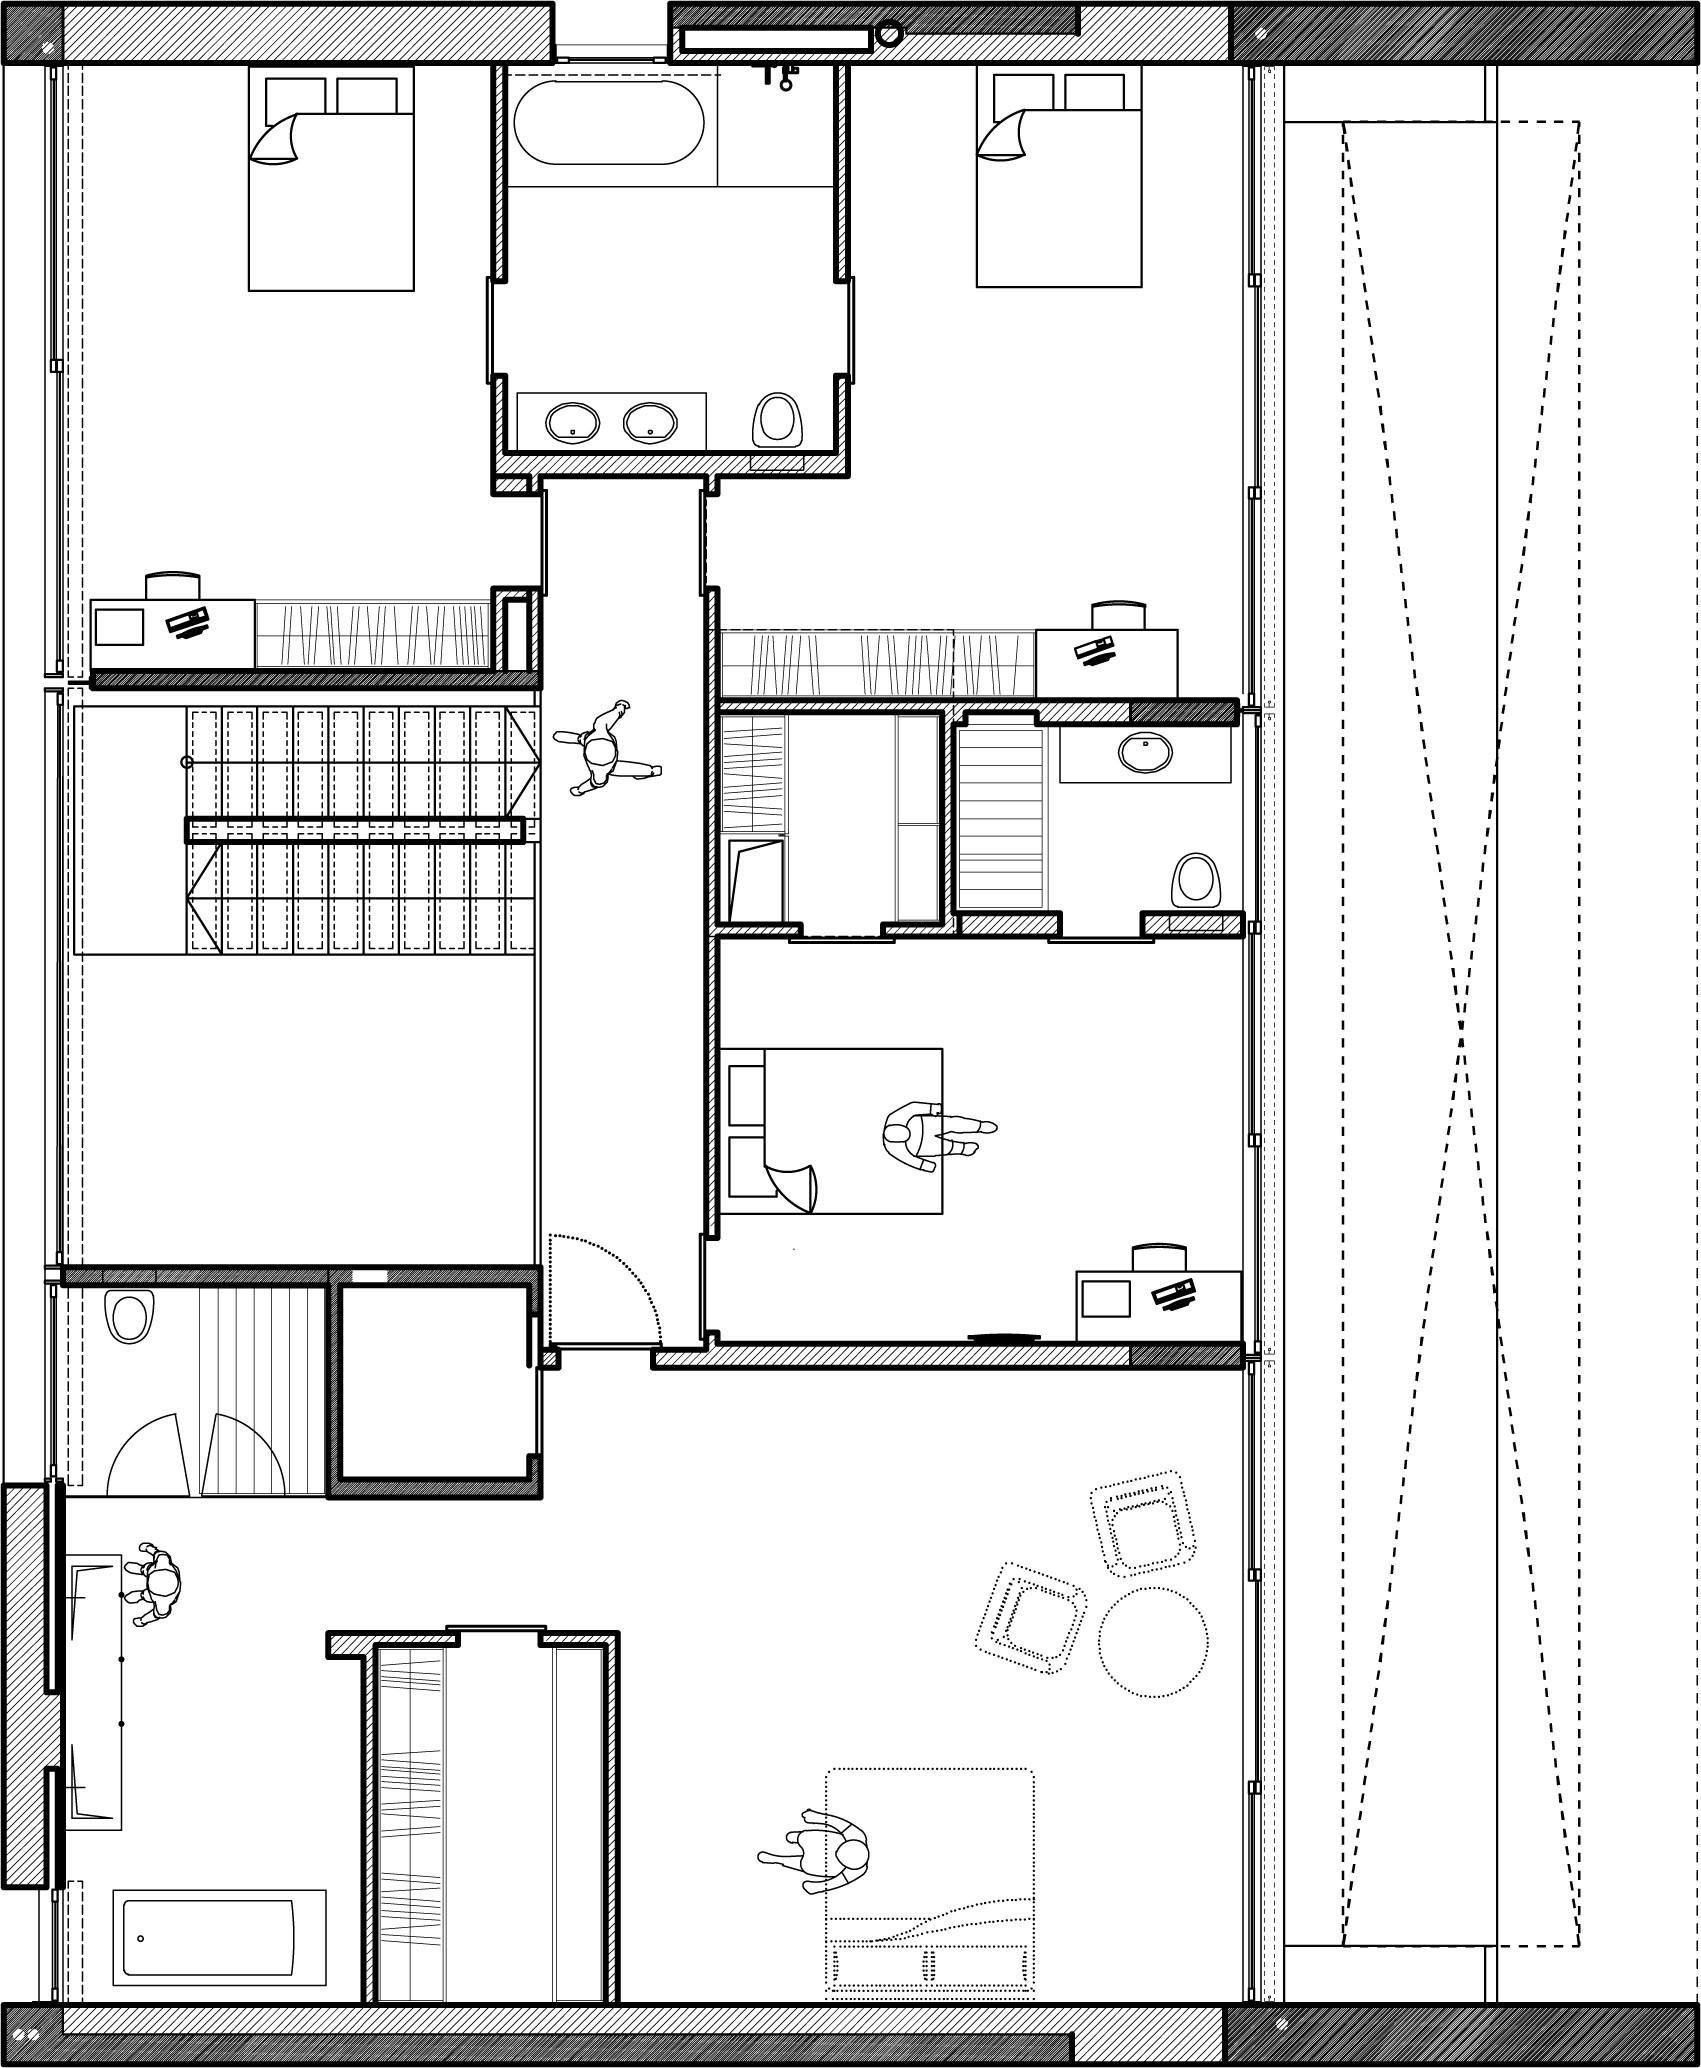 Small Cabin Blueprints Gallery Of Kfar Shmaryahu House Pitsou Kedem Architects 21